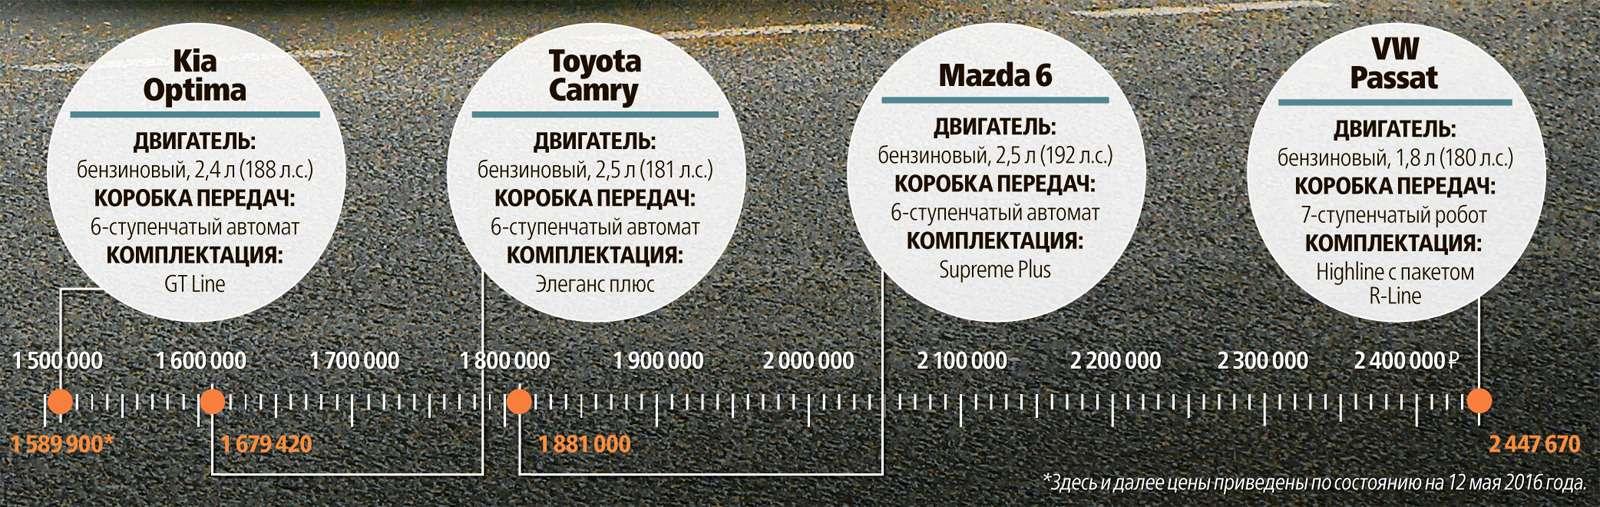 Супертест: новая Kia Optima против трех конкурентов— фото 596203